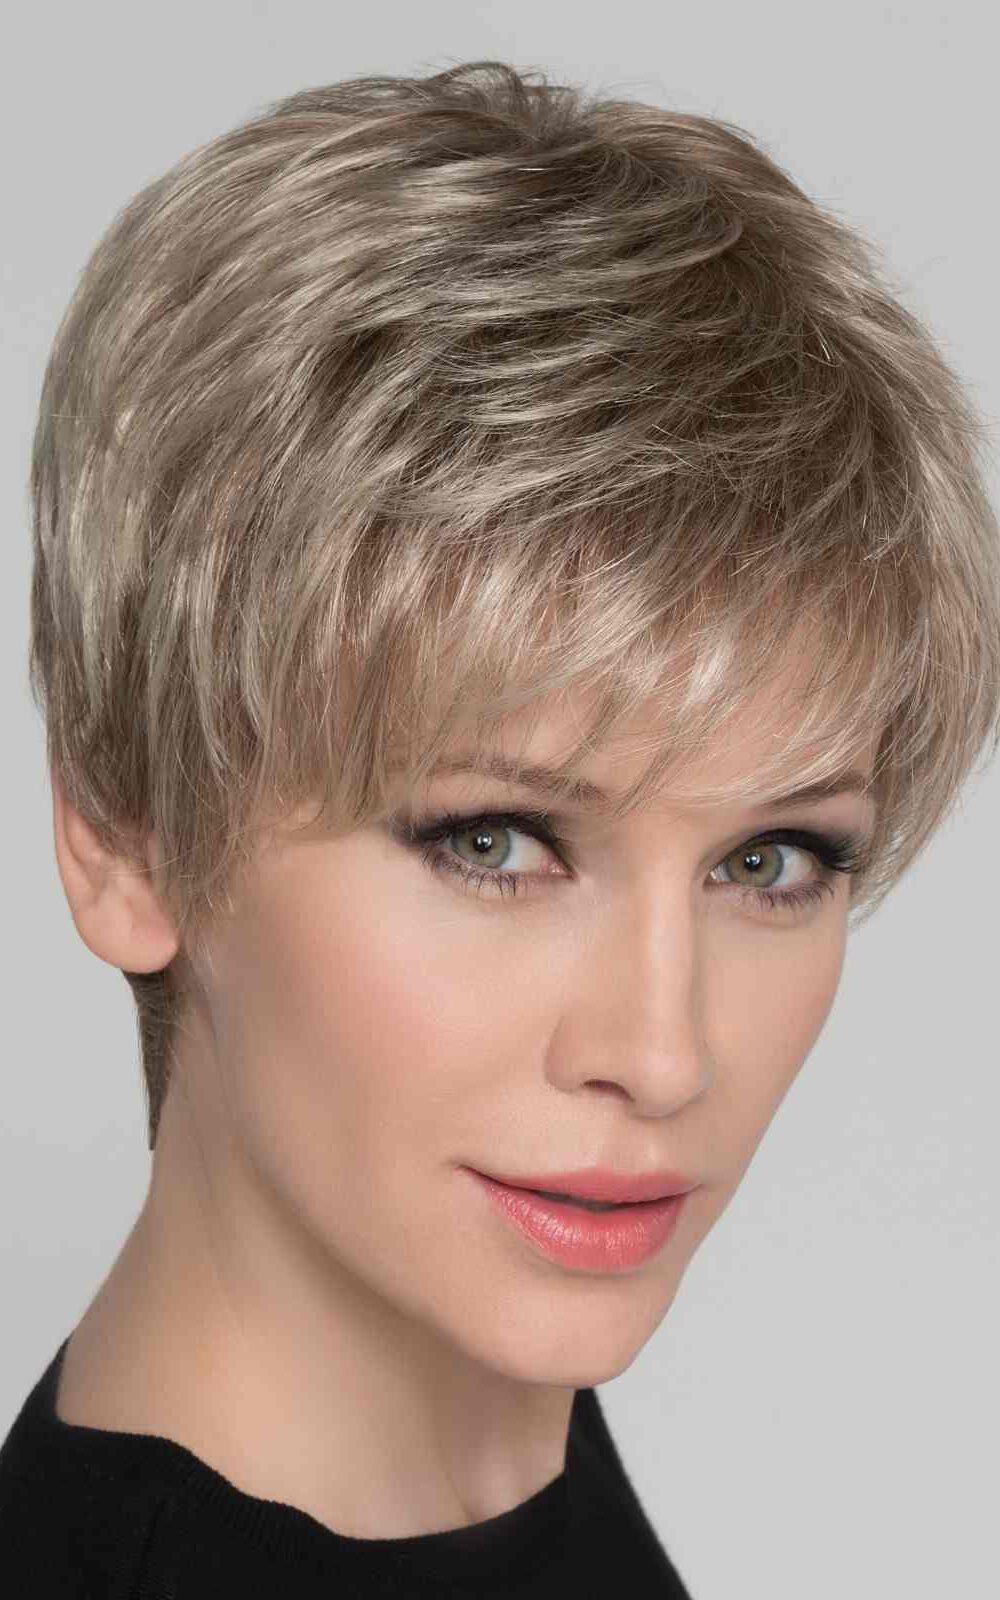 Carol | Synthetic Lace Front Wig (Mono Crown) by Ellen Wille | Sandy Blonde Mix | Elly-K.com.au